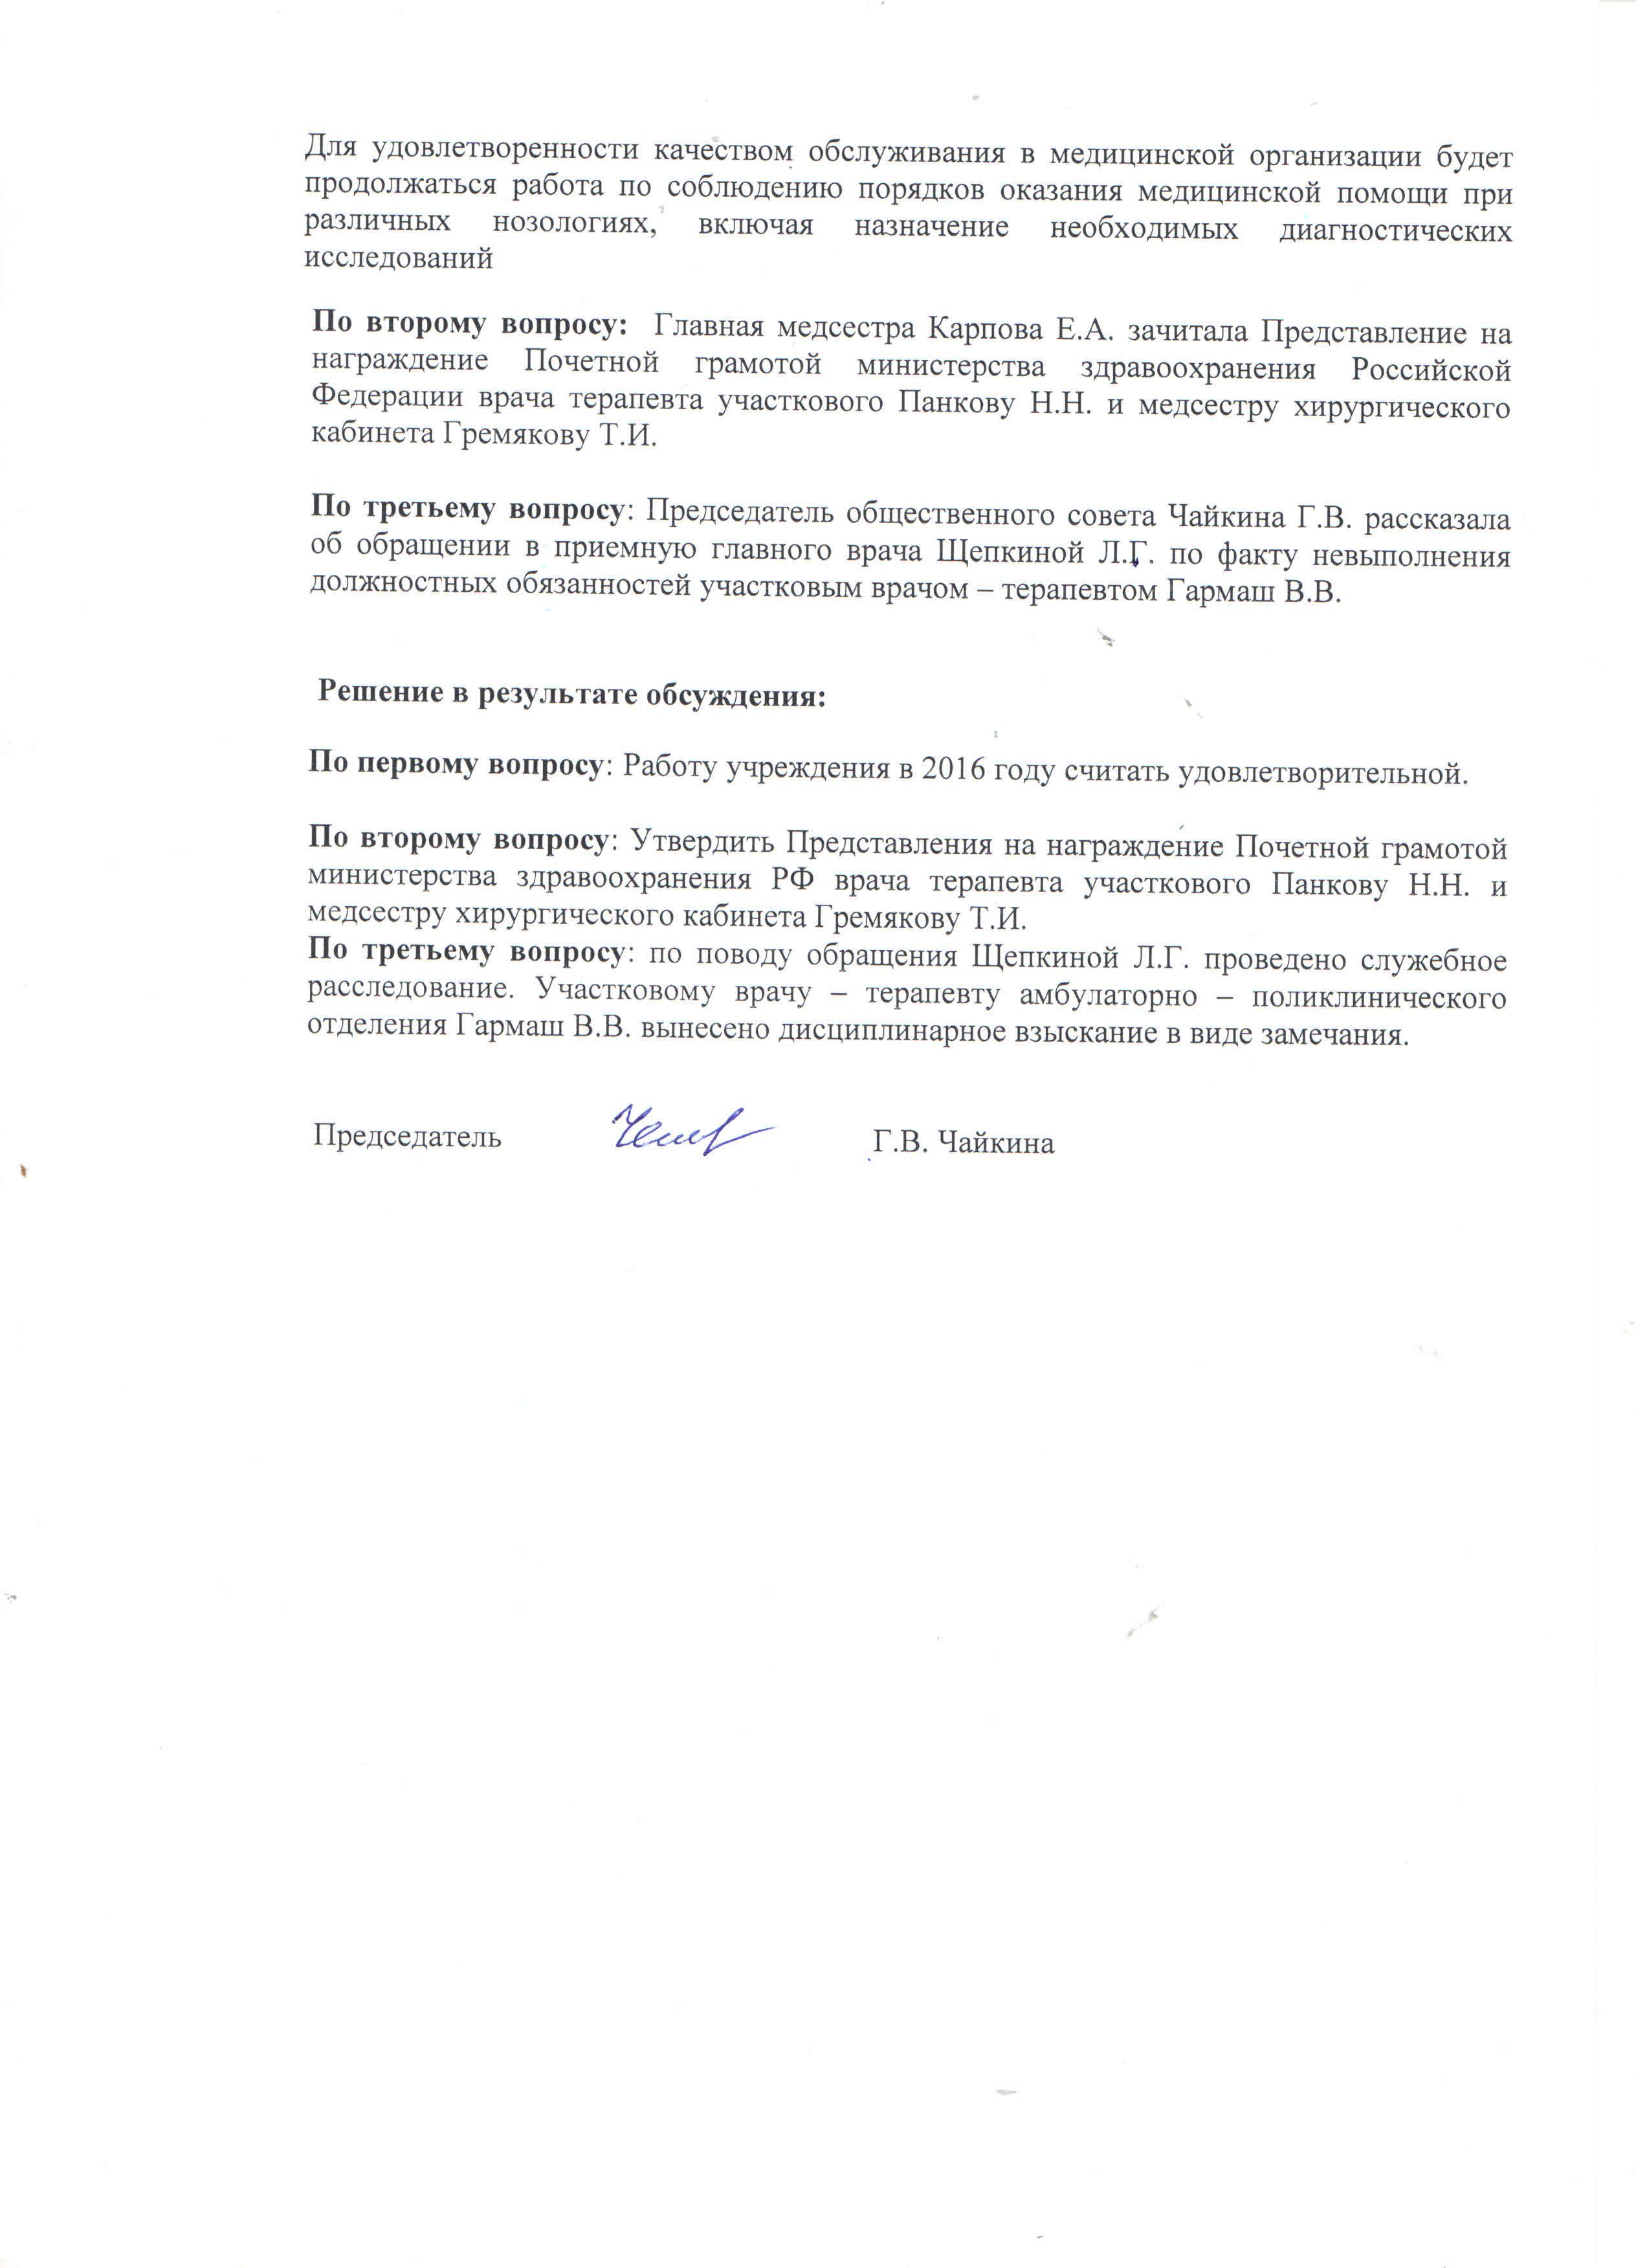 protocol january 2